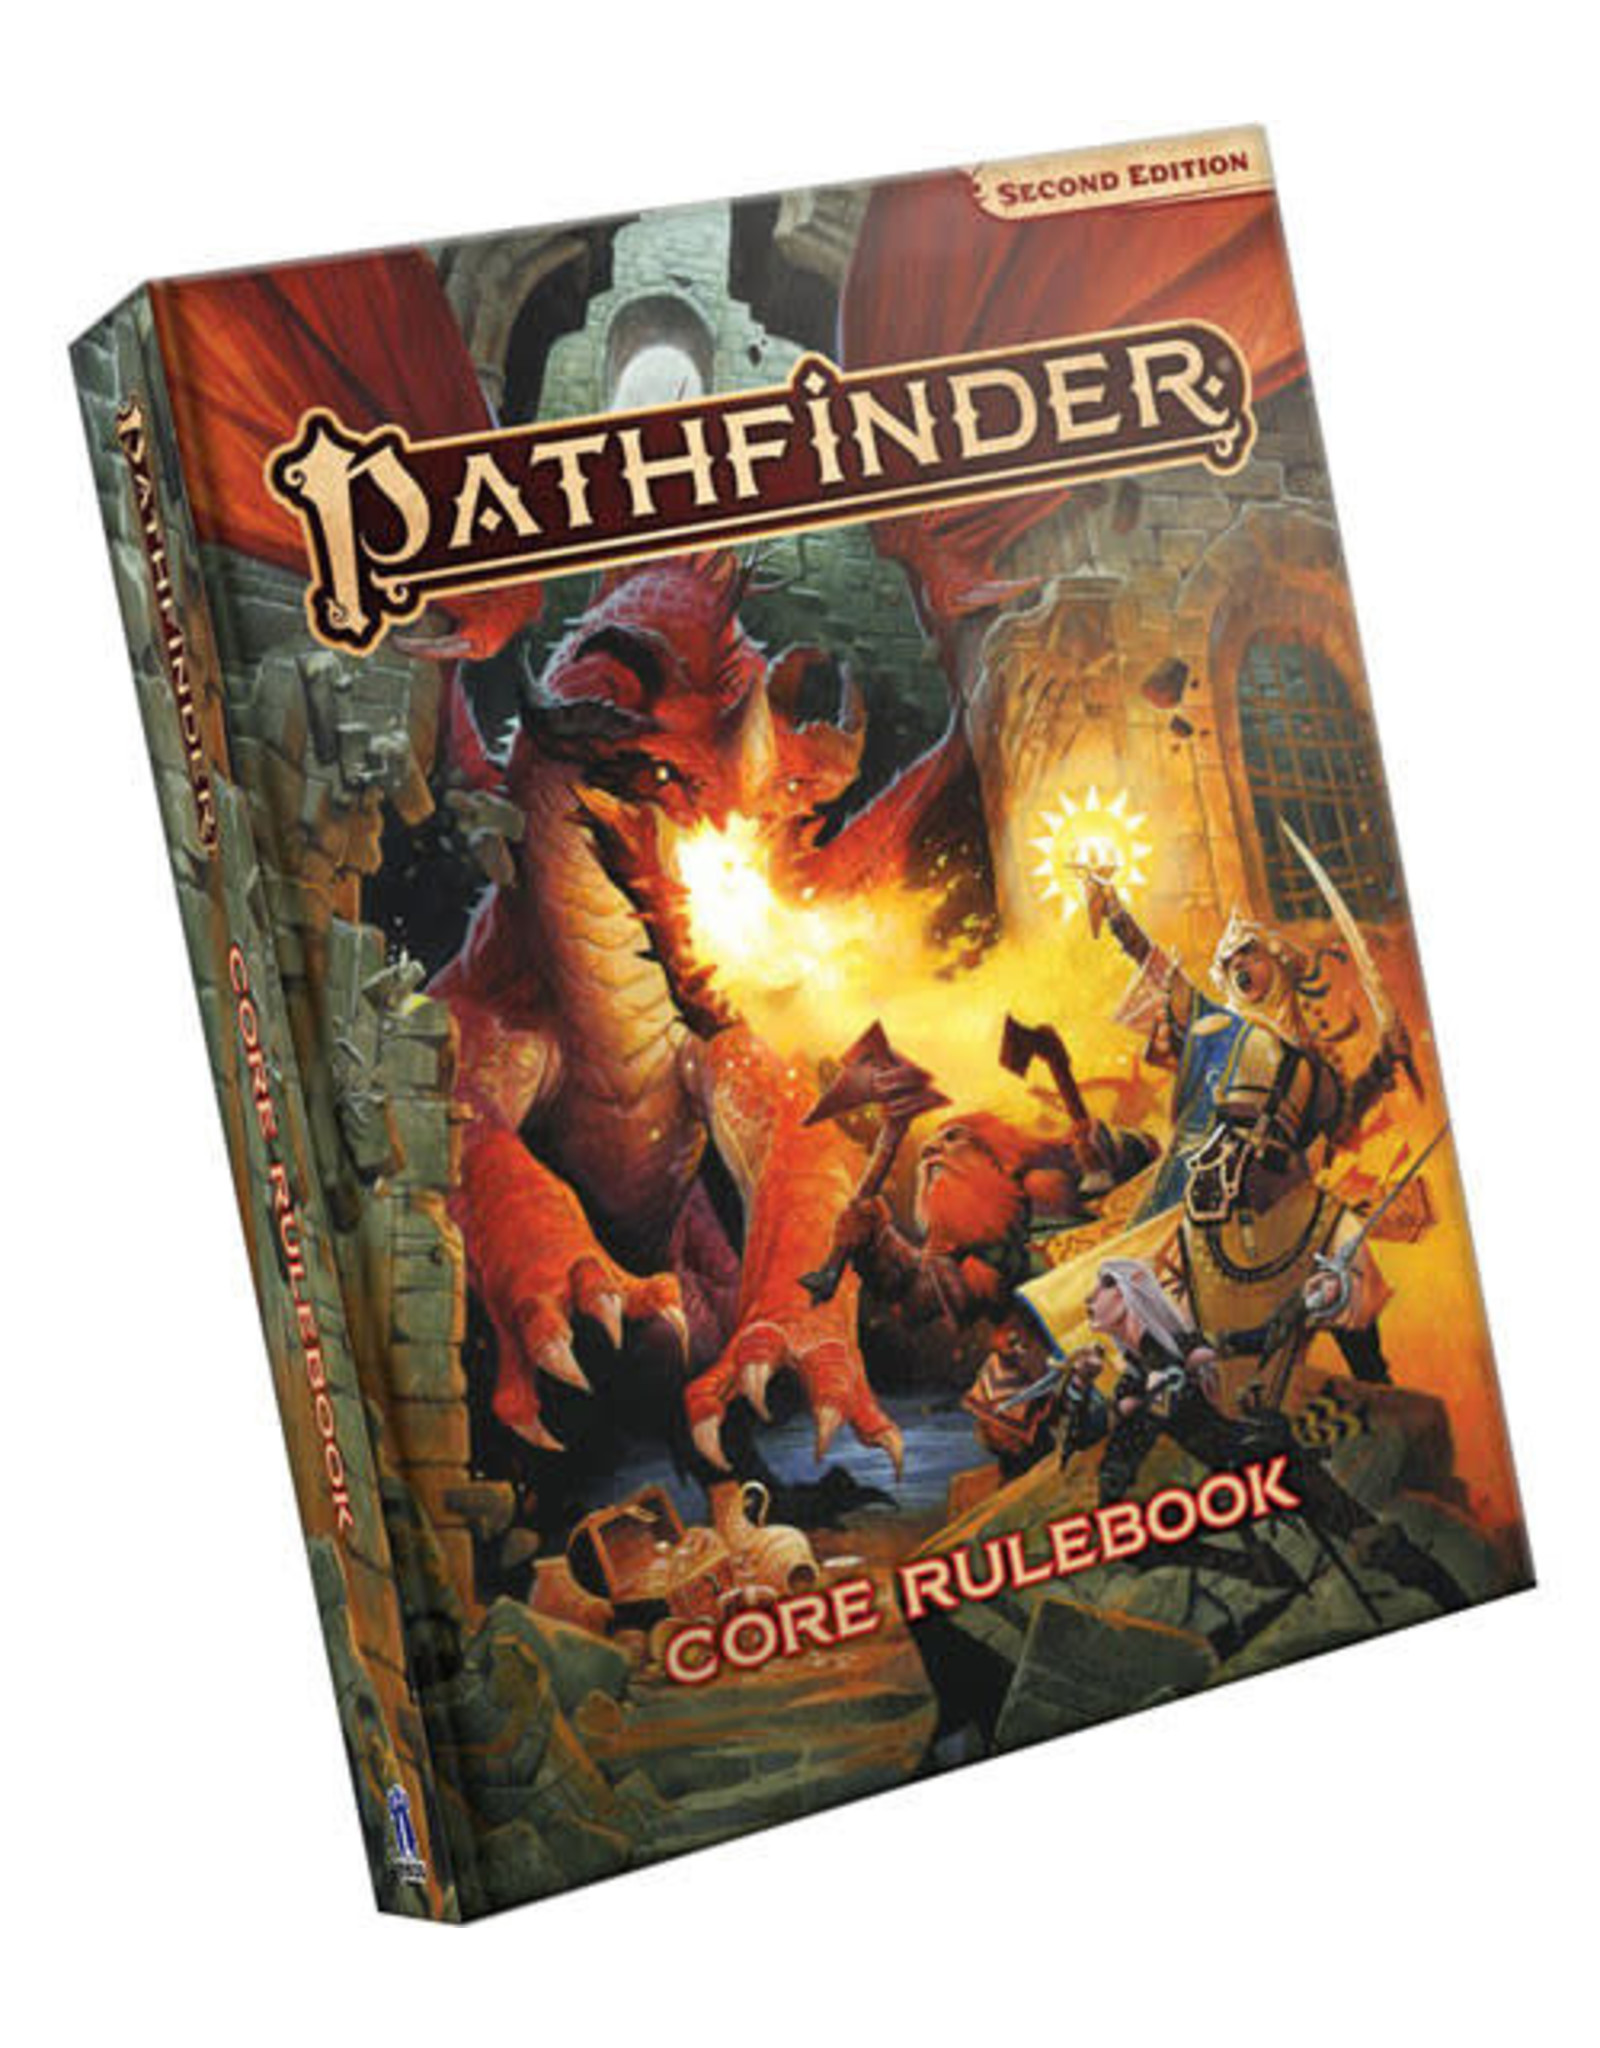 Pathfinder 2e Core Rulebook